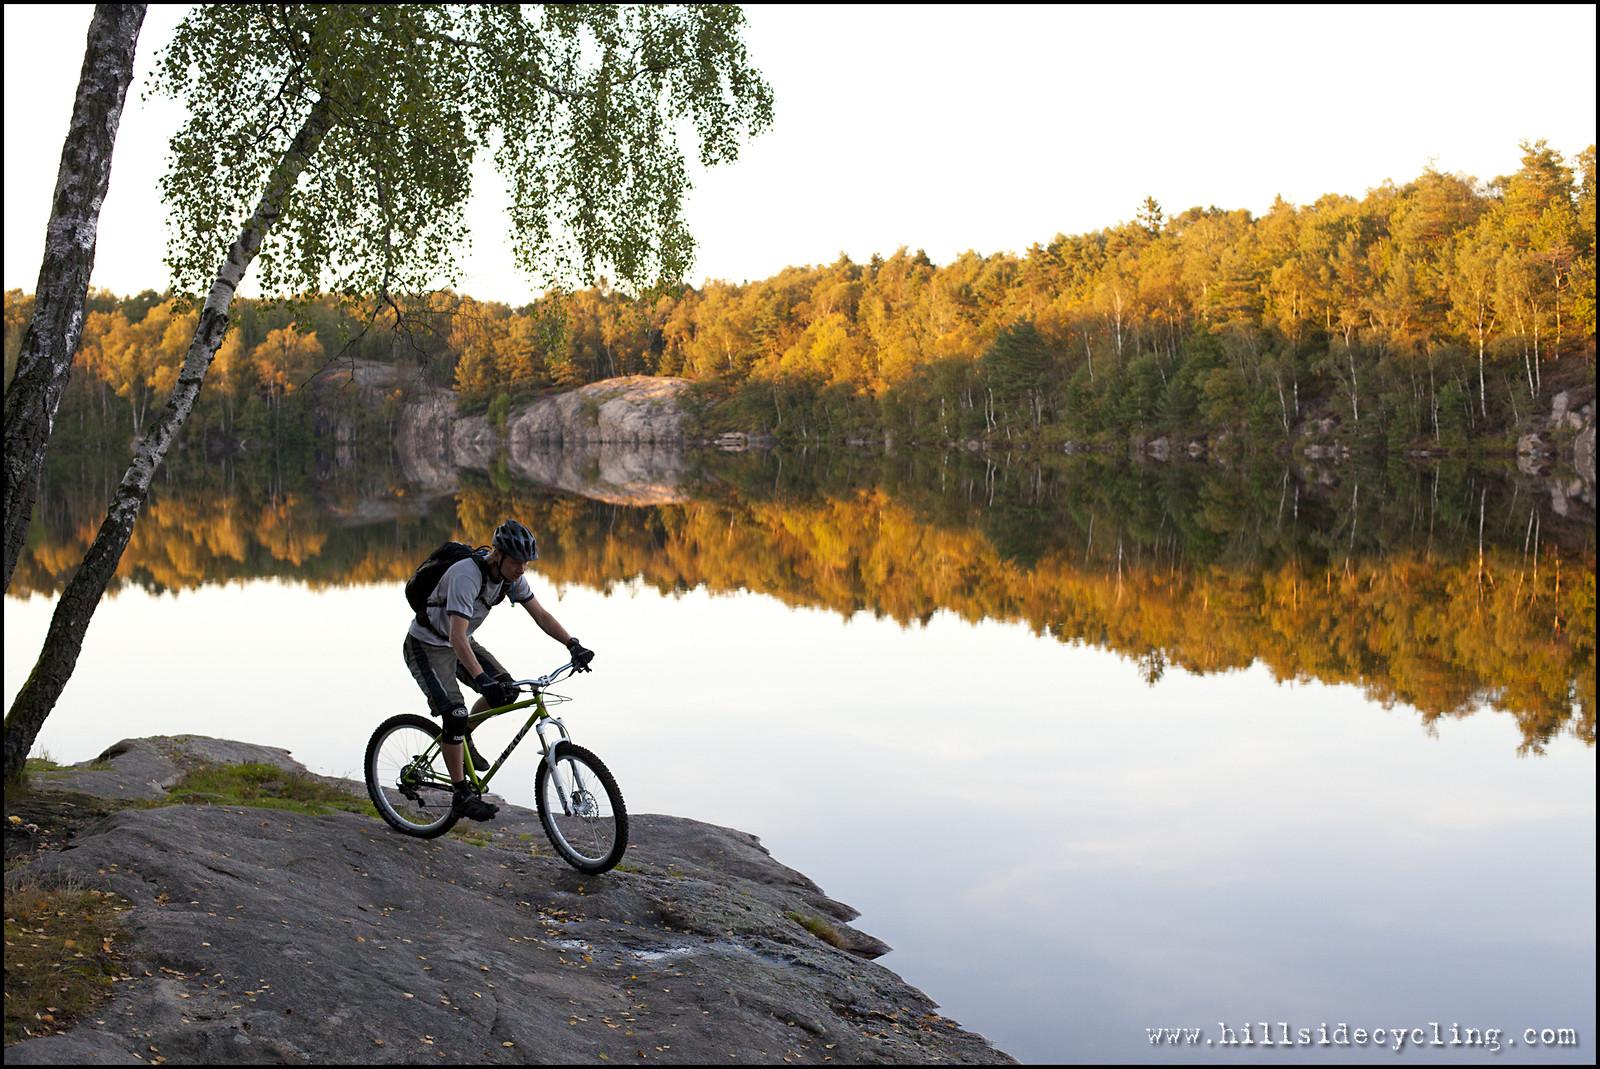 Late summer ride - Hillside Cycling - Mountain Biking Pictures - Vital MTB